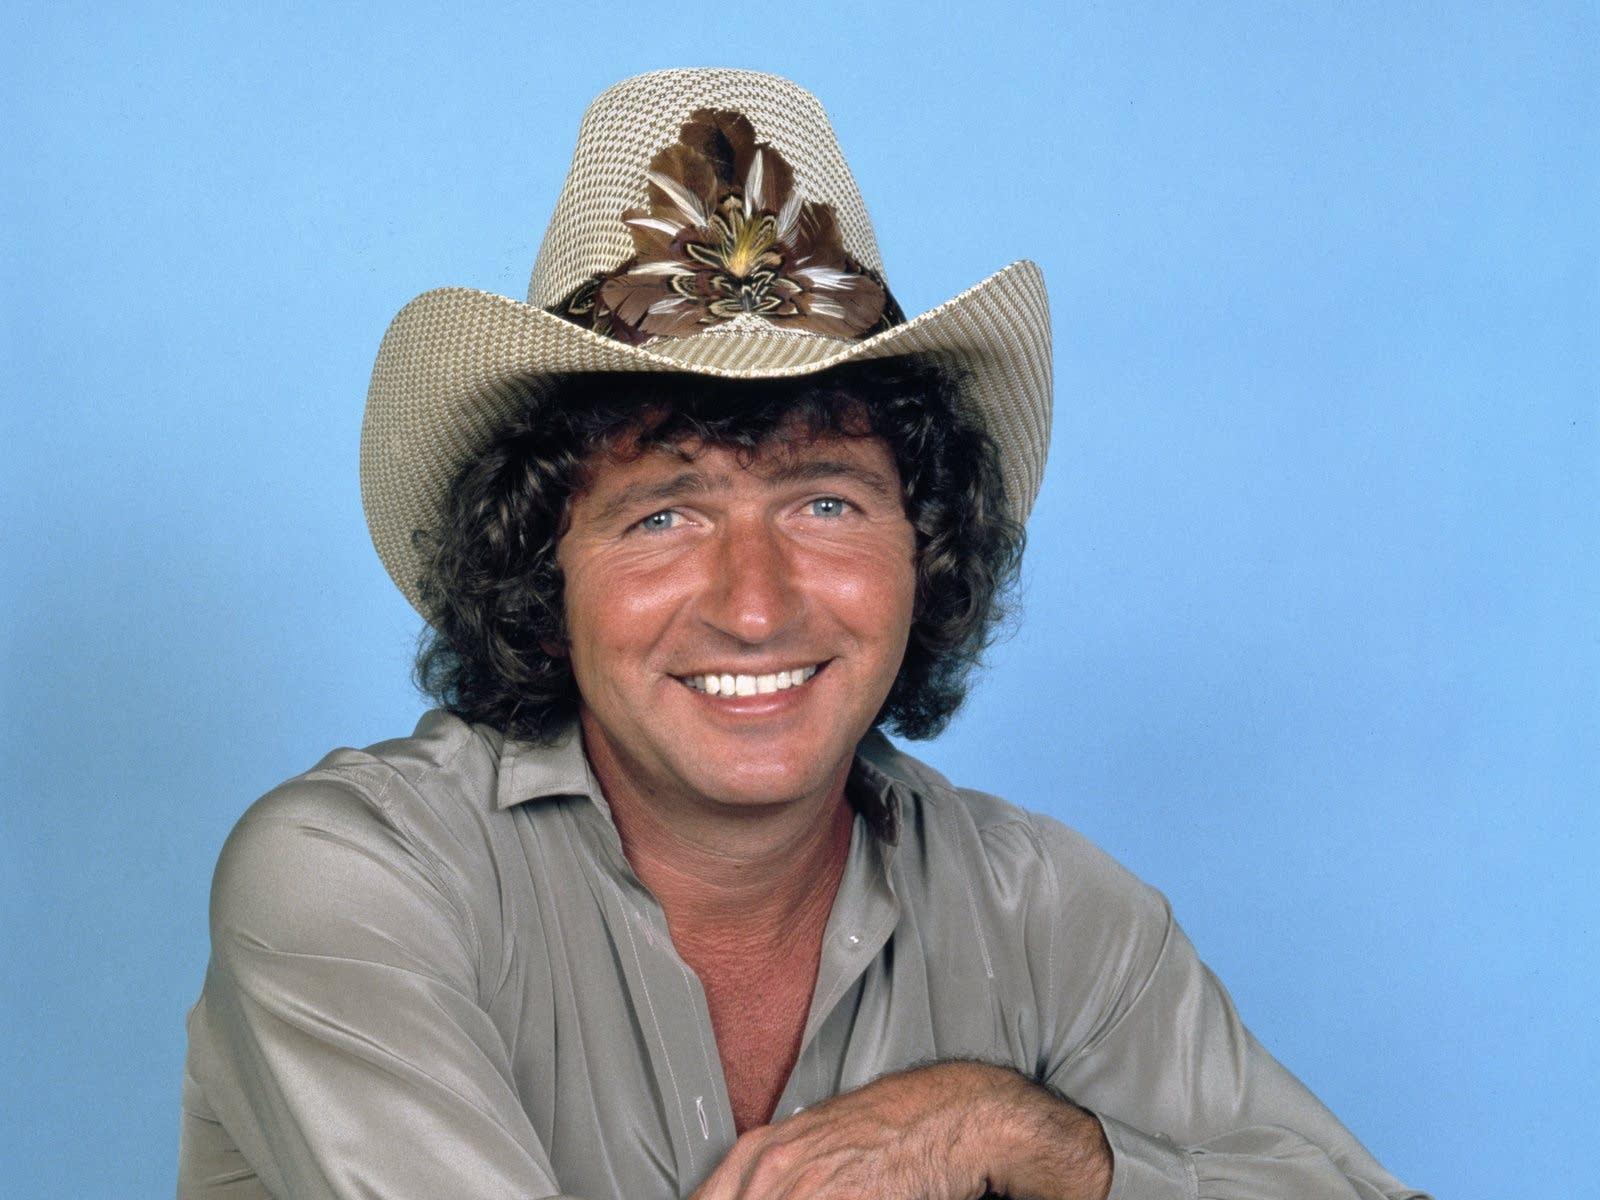 Singer-songwriter Mac Davis in 1981